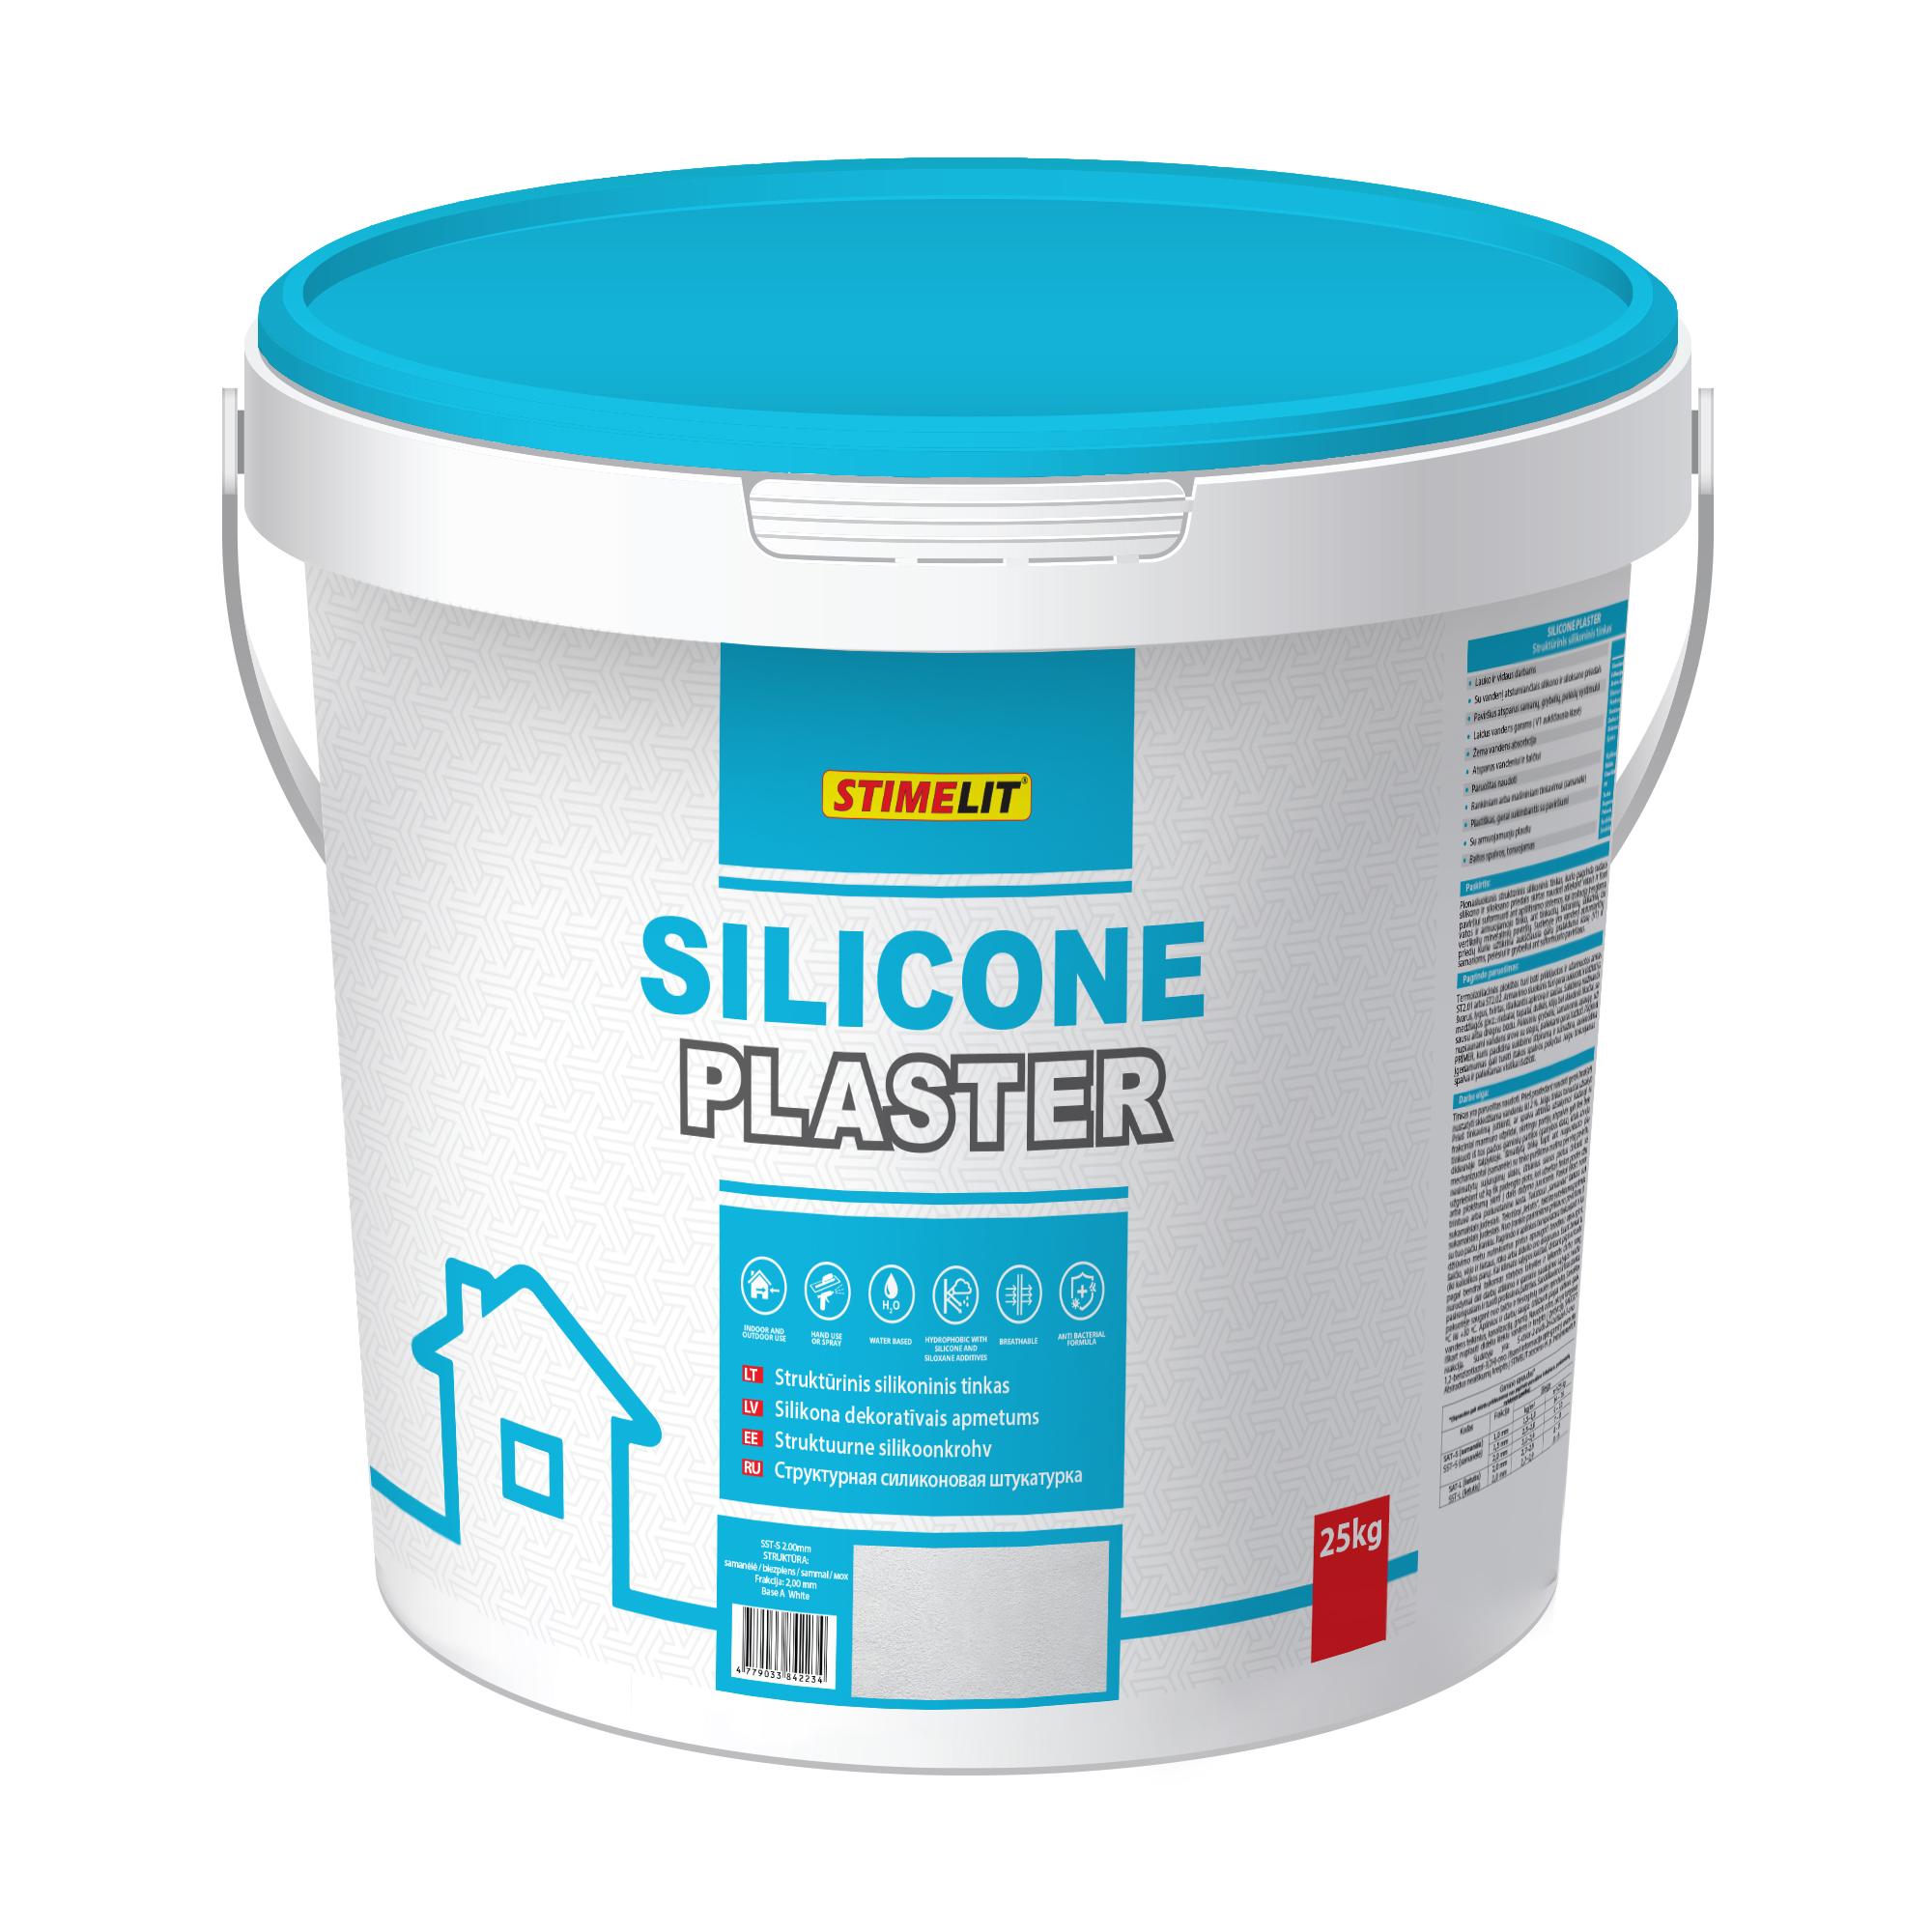 SILICONE PLASTER Silikona dekoratīvais apmetums